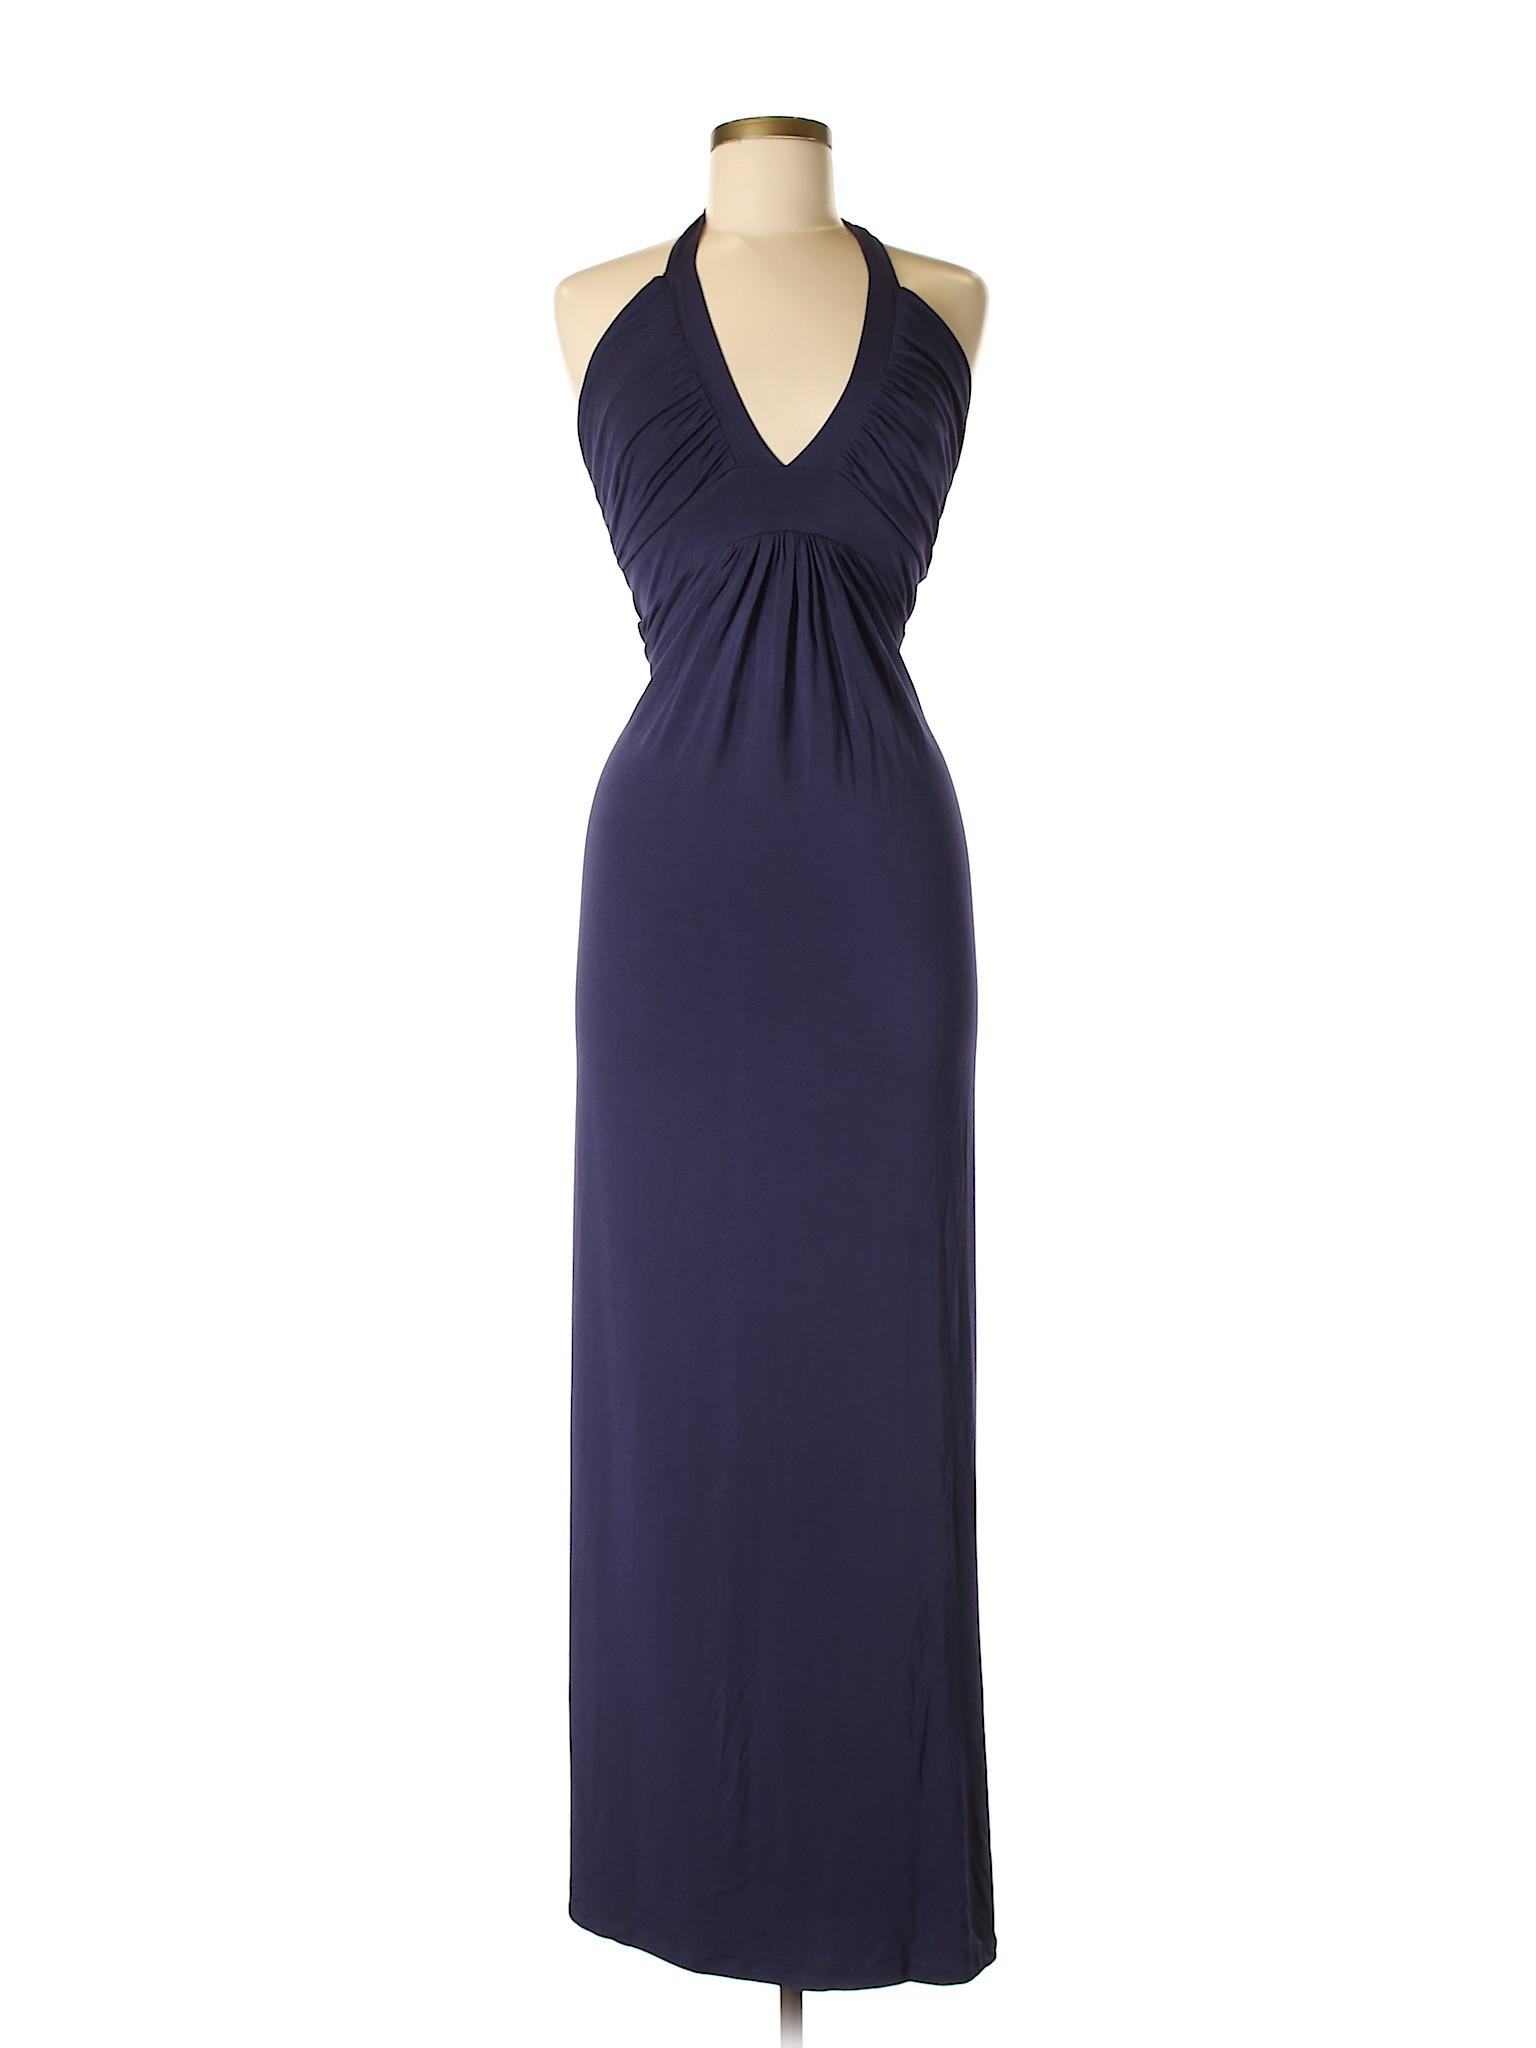 Dress Tart winter Casual winter Casual Tart Dress winter Boutique Boutique Boutique 7q8wwOfvx